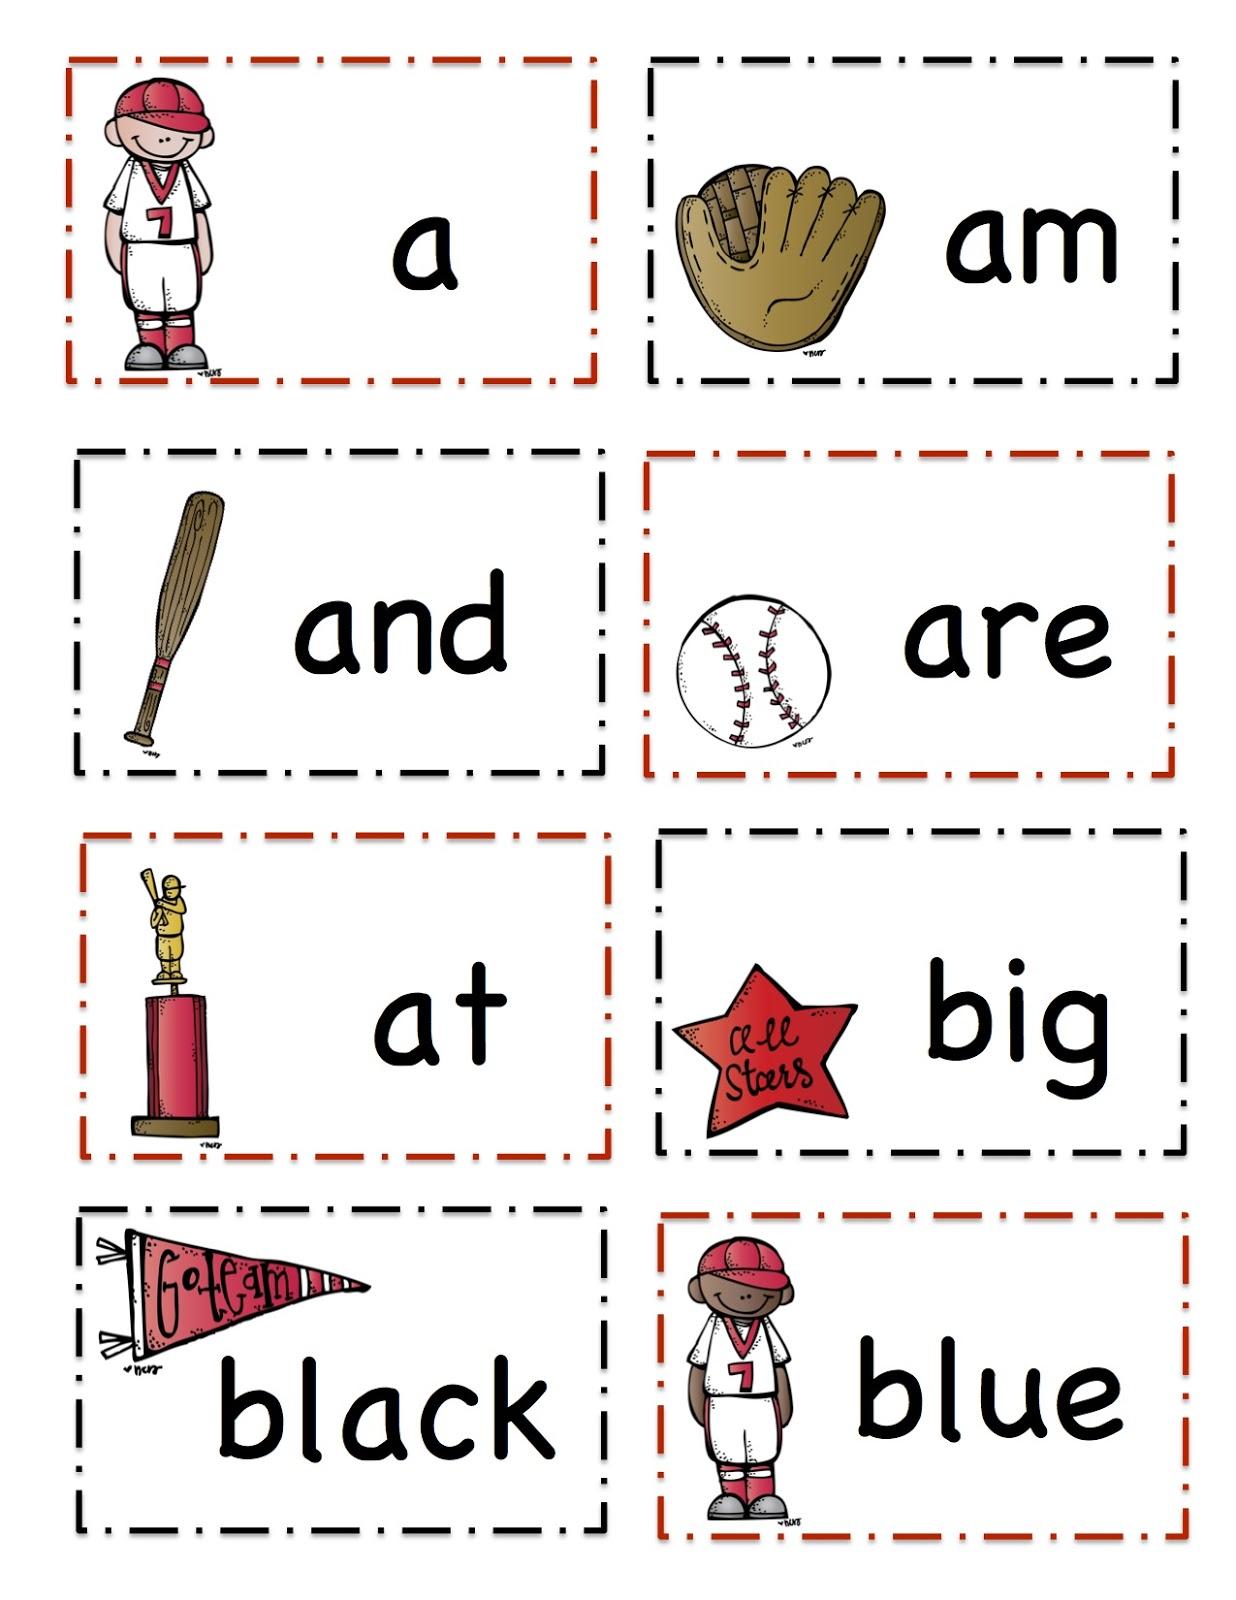 sight sight .com/product/PreschoolPrintable/kindergarten  printables word word where cards